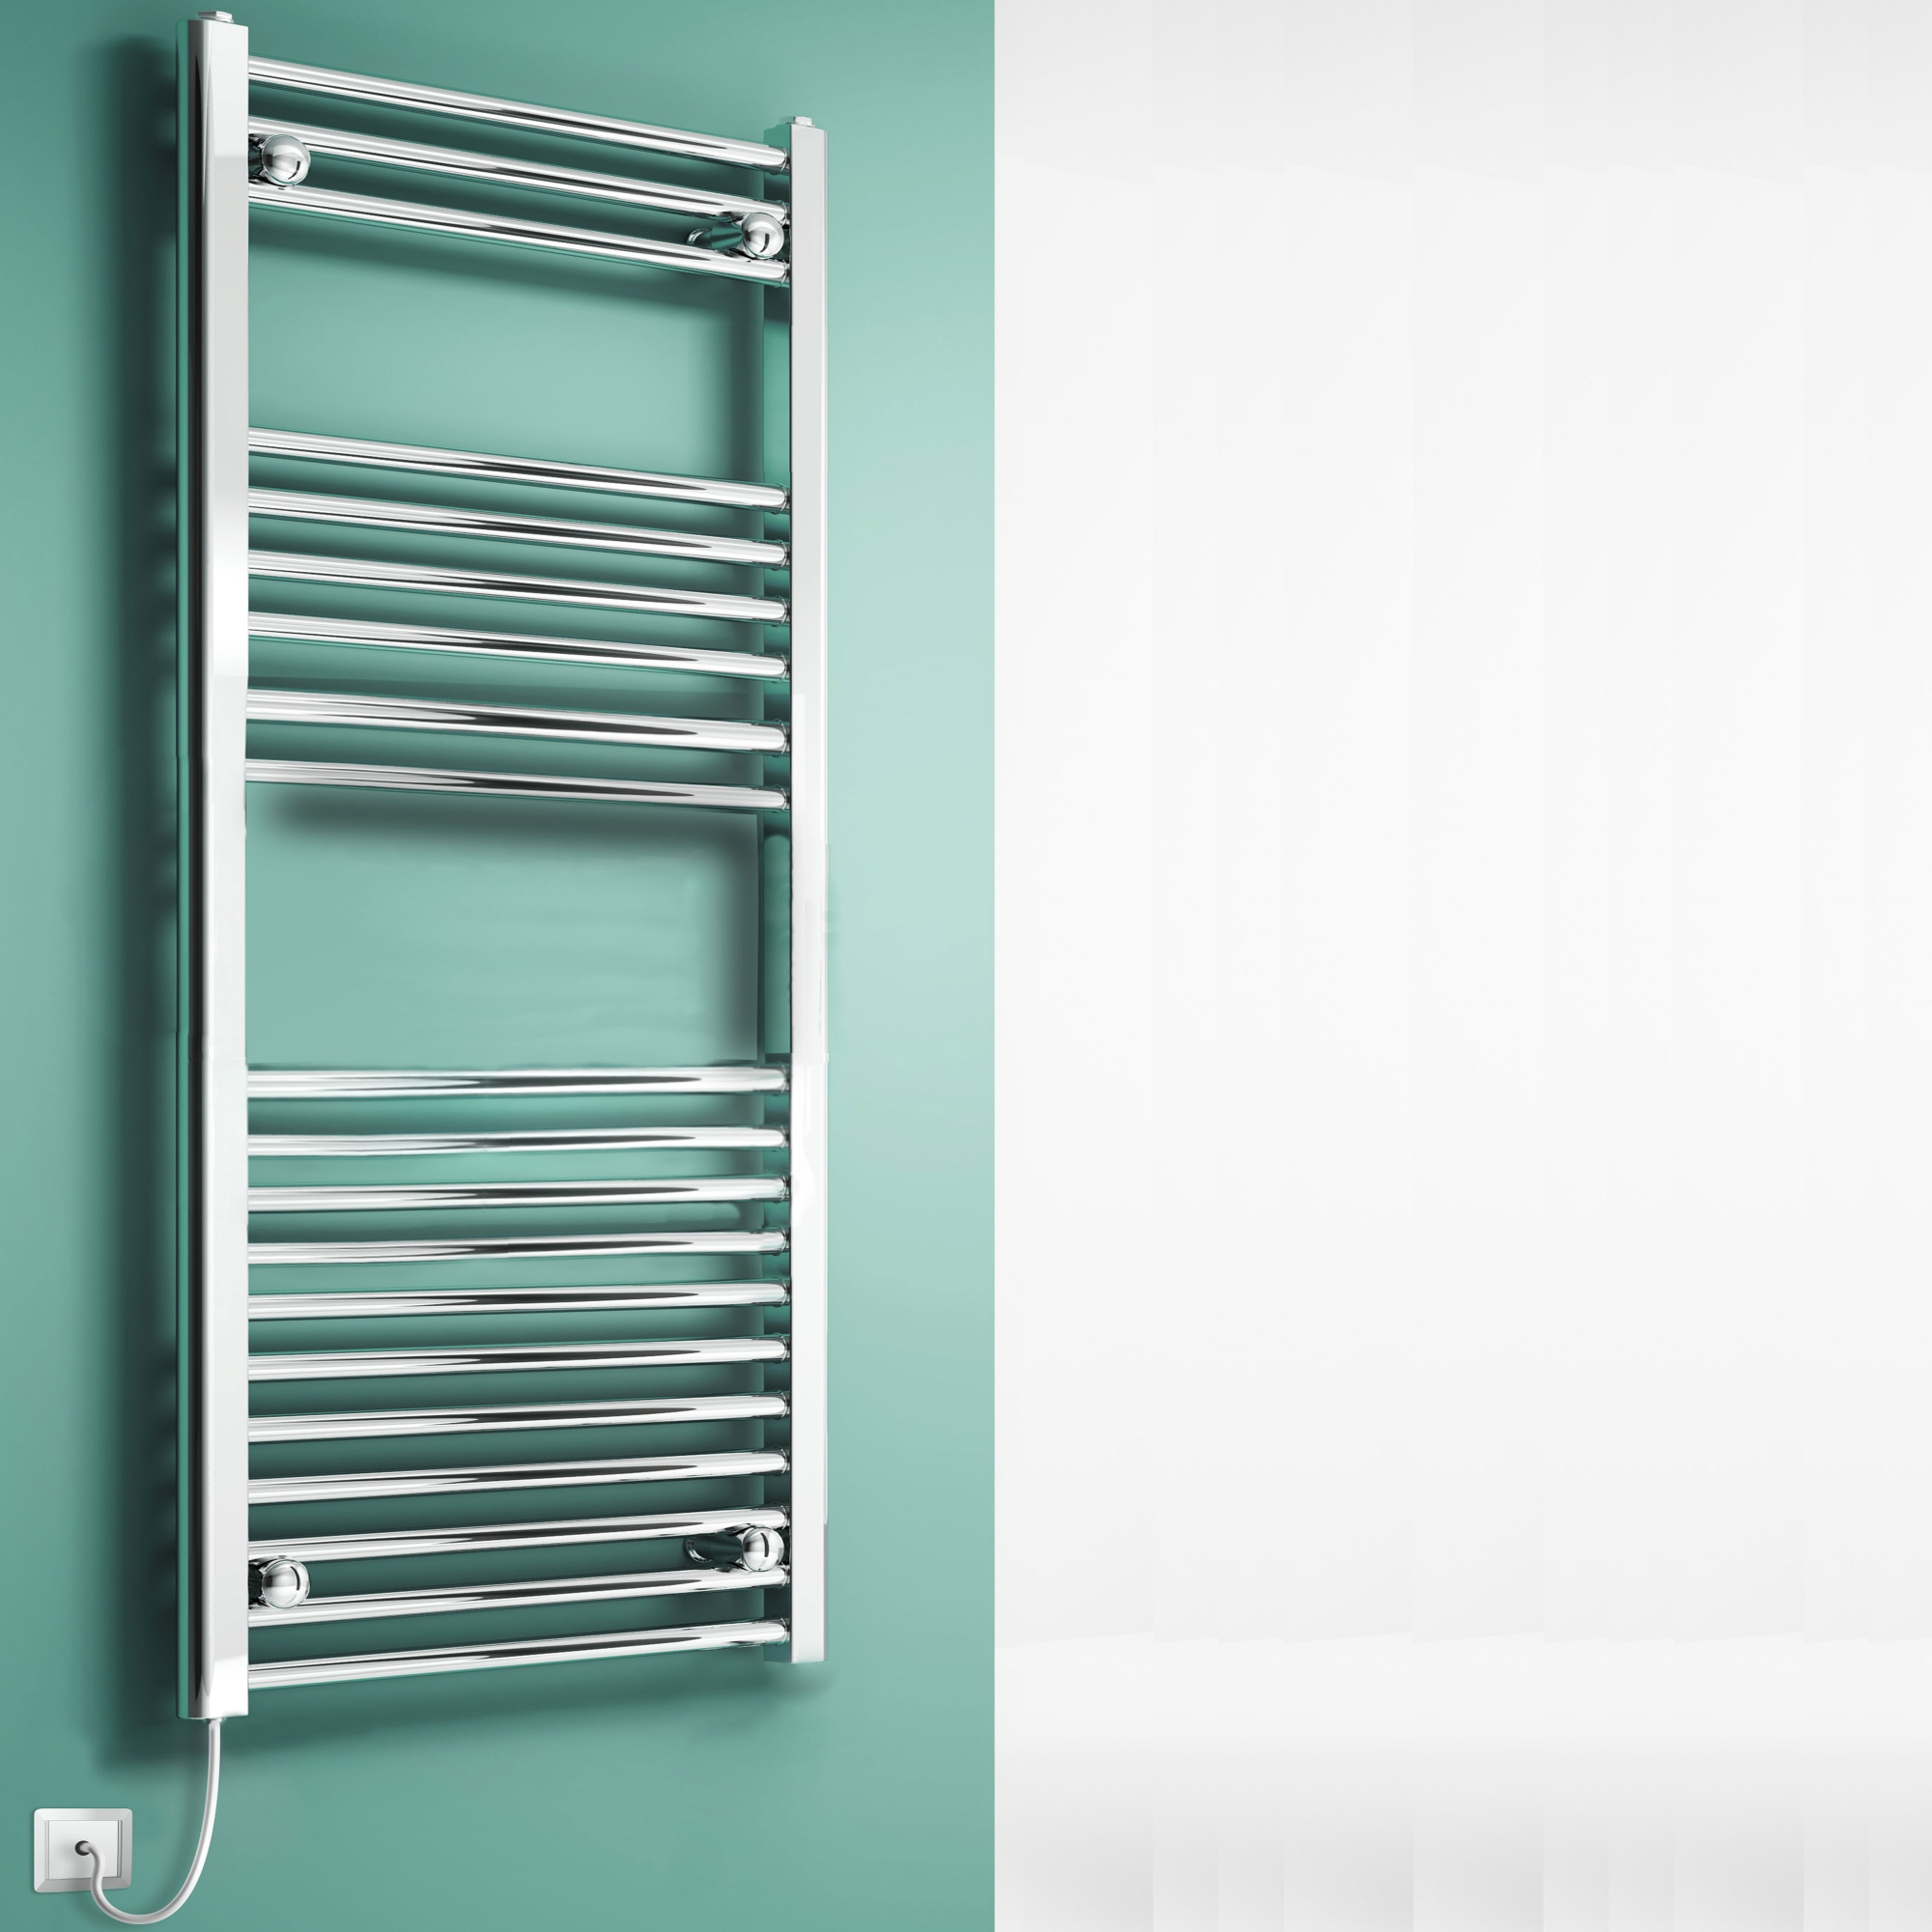 Reina Eross Dry Electric Heated Flat Towel Rail 1100mm H x 500mm W